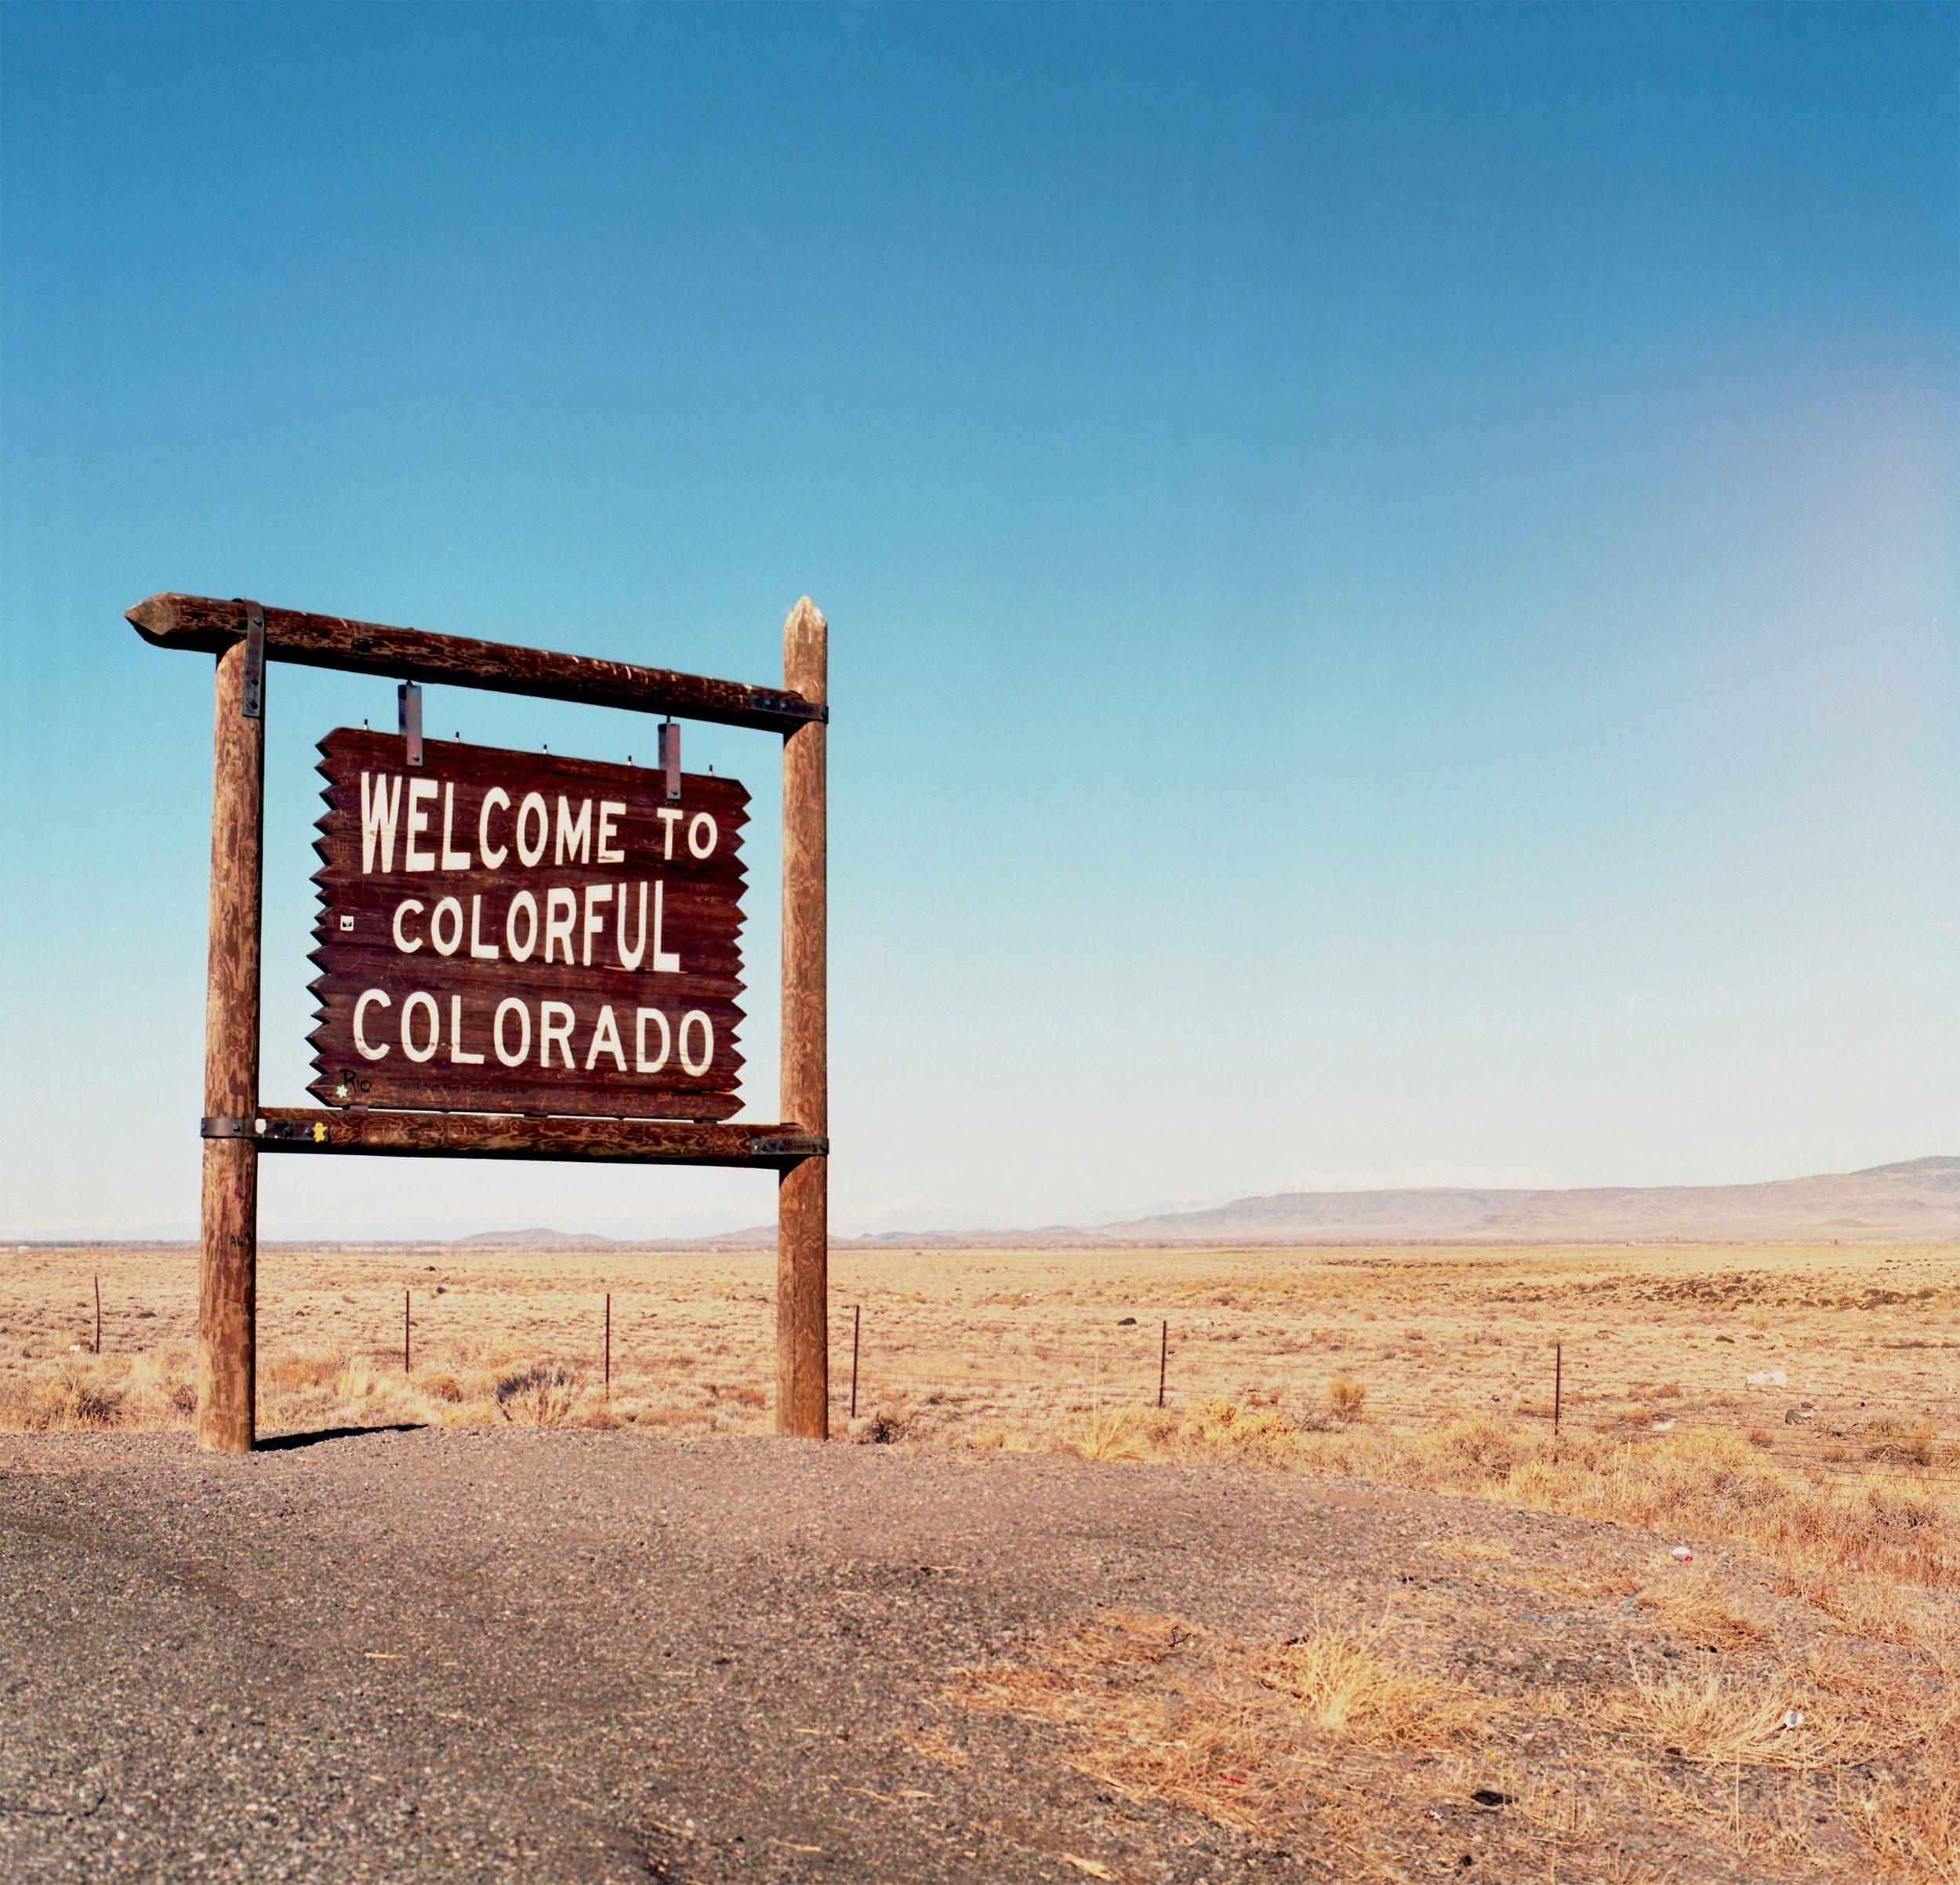 loge comes to breckenridge colorado - Kait Herzog photo